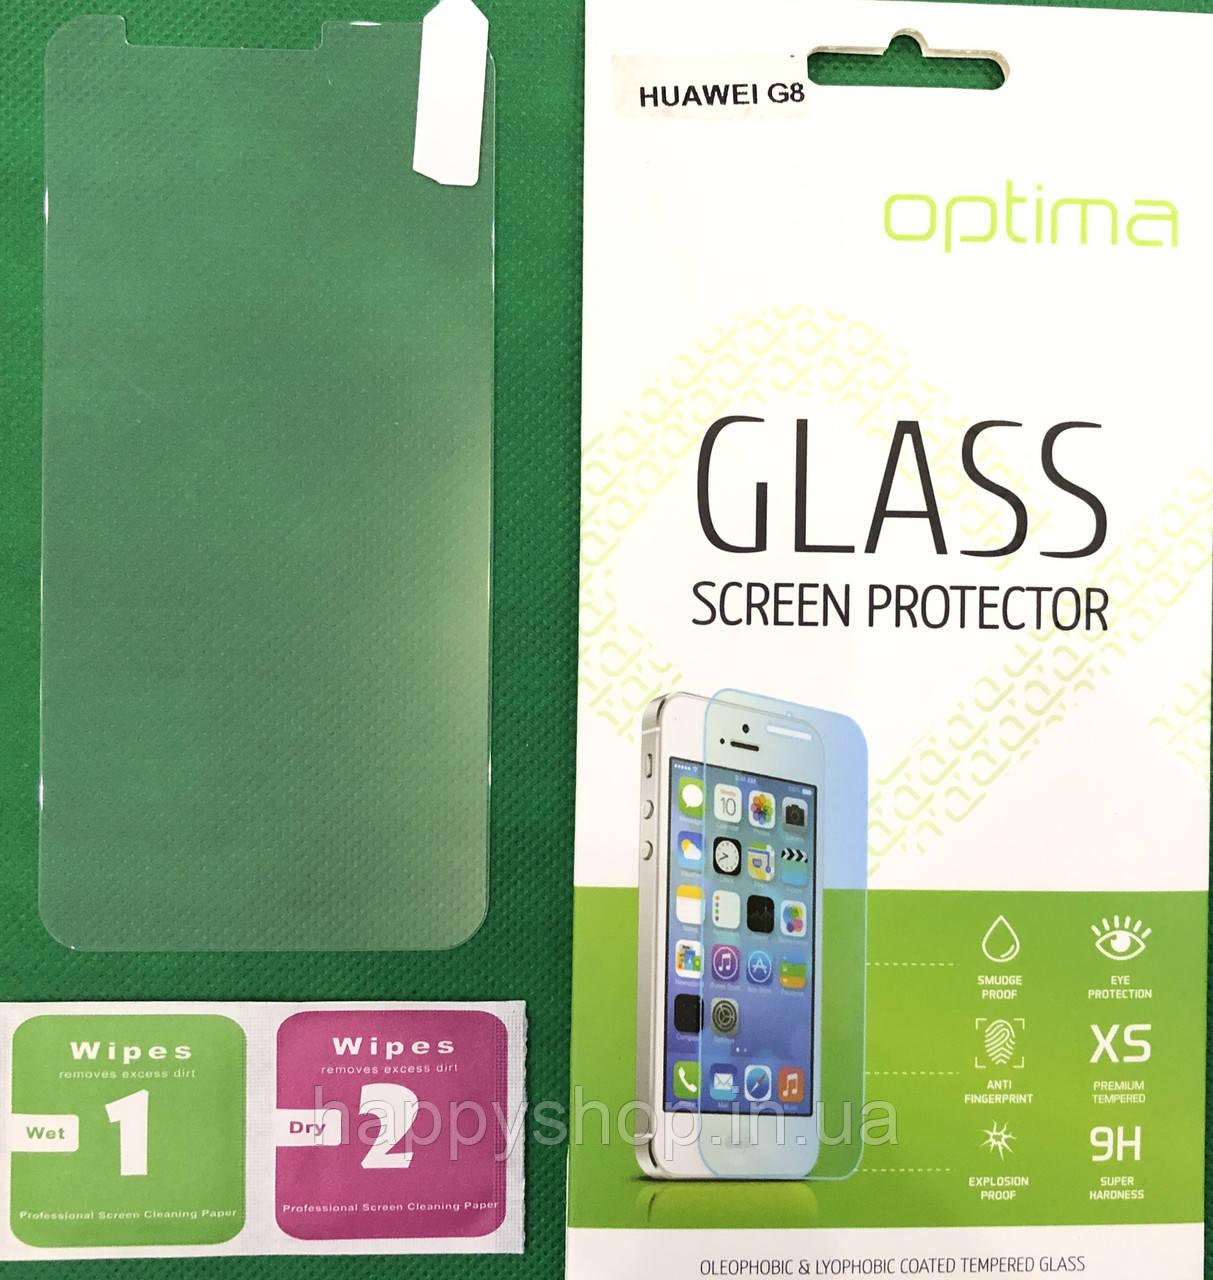 Защитное стекло для Huawei Ascend G8 (RIO-L01)